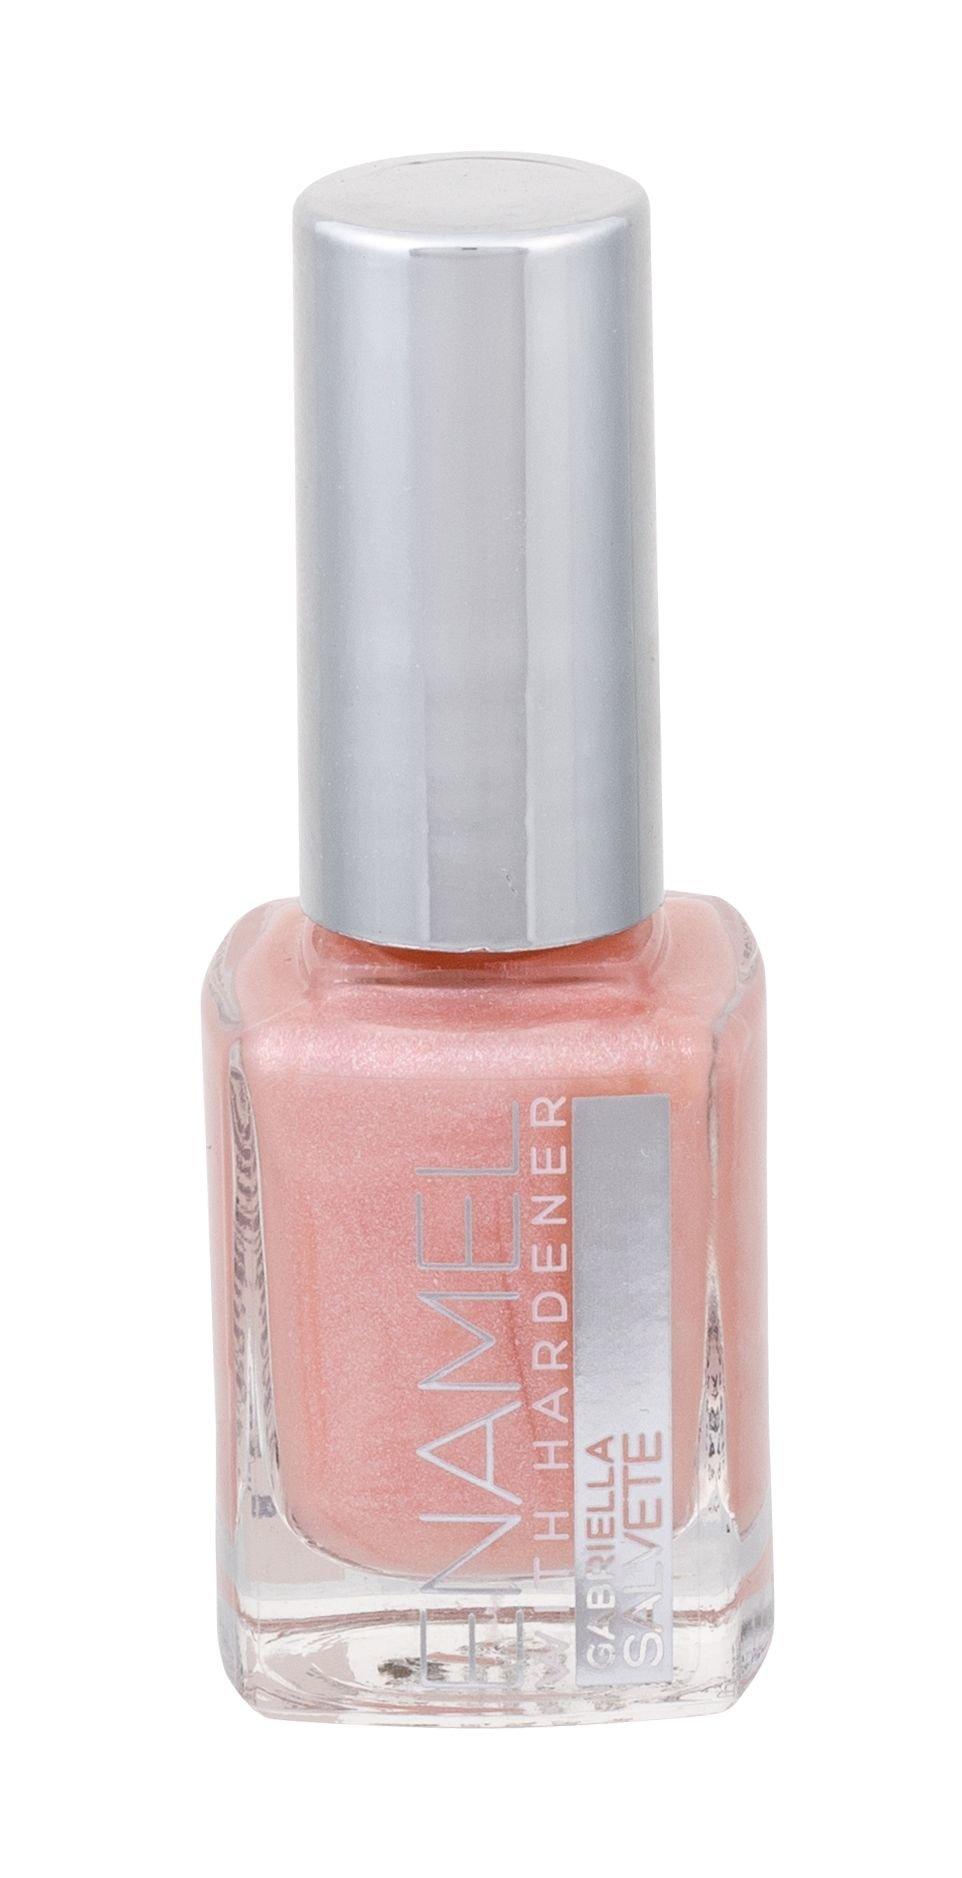 Gabriella Salvete Nail Enamel With Hardener Cosmetic 11ml 124